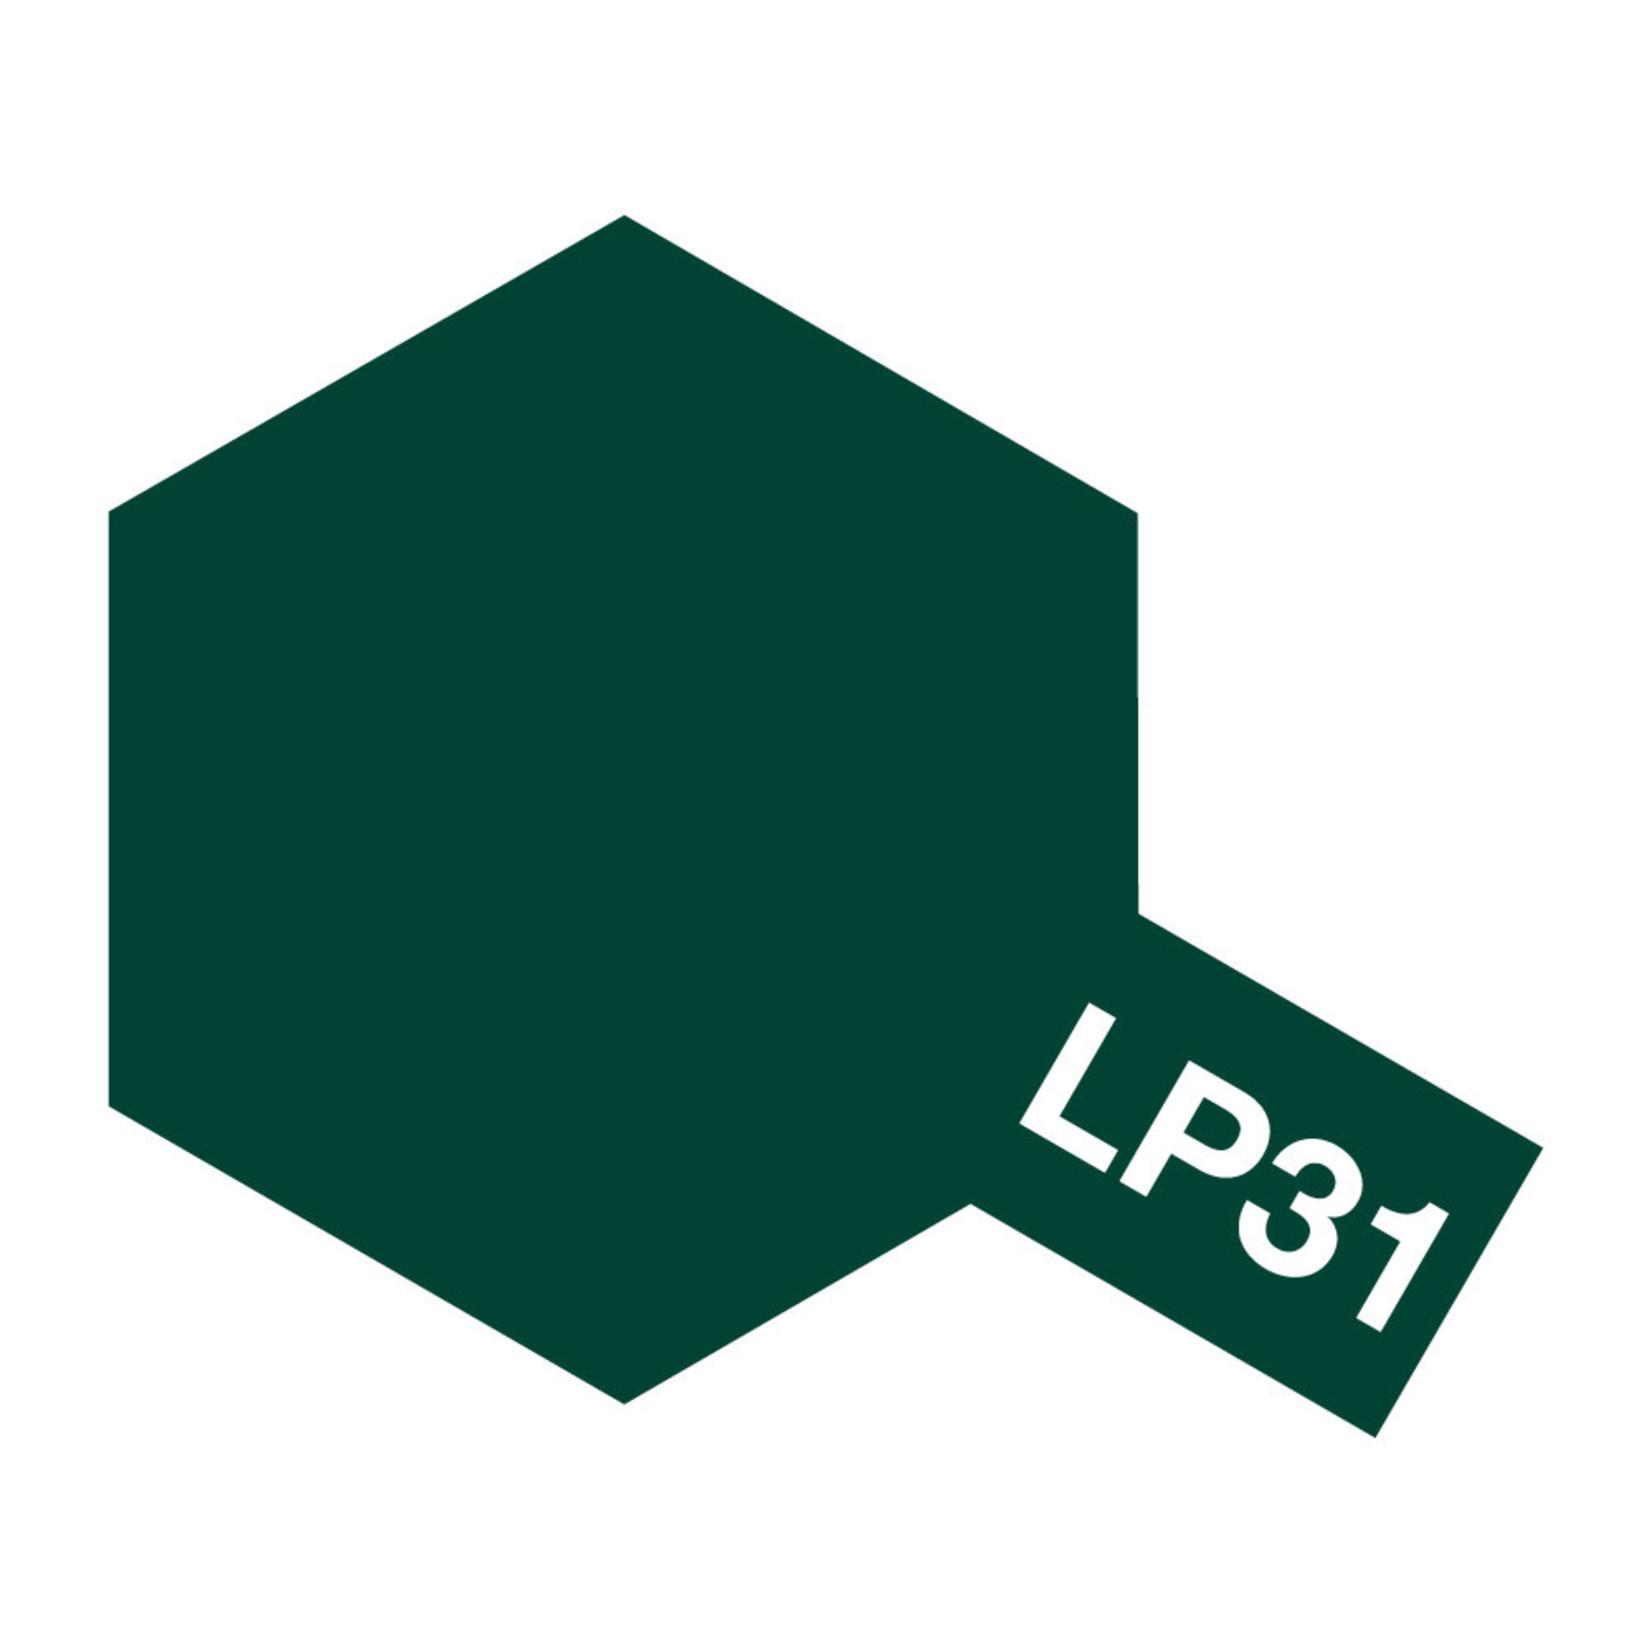 Tamiya TAMLP31 Lacquer Dark Green 2 (10ml)